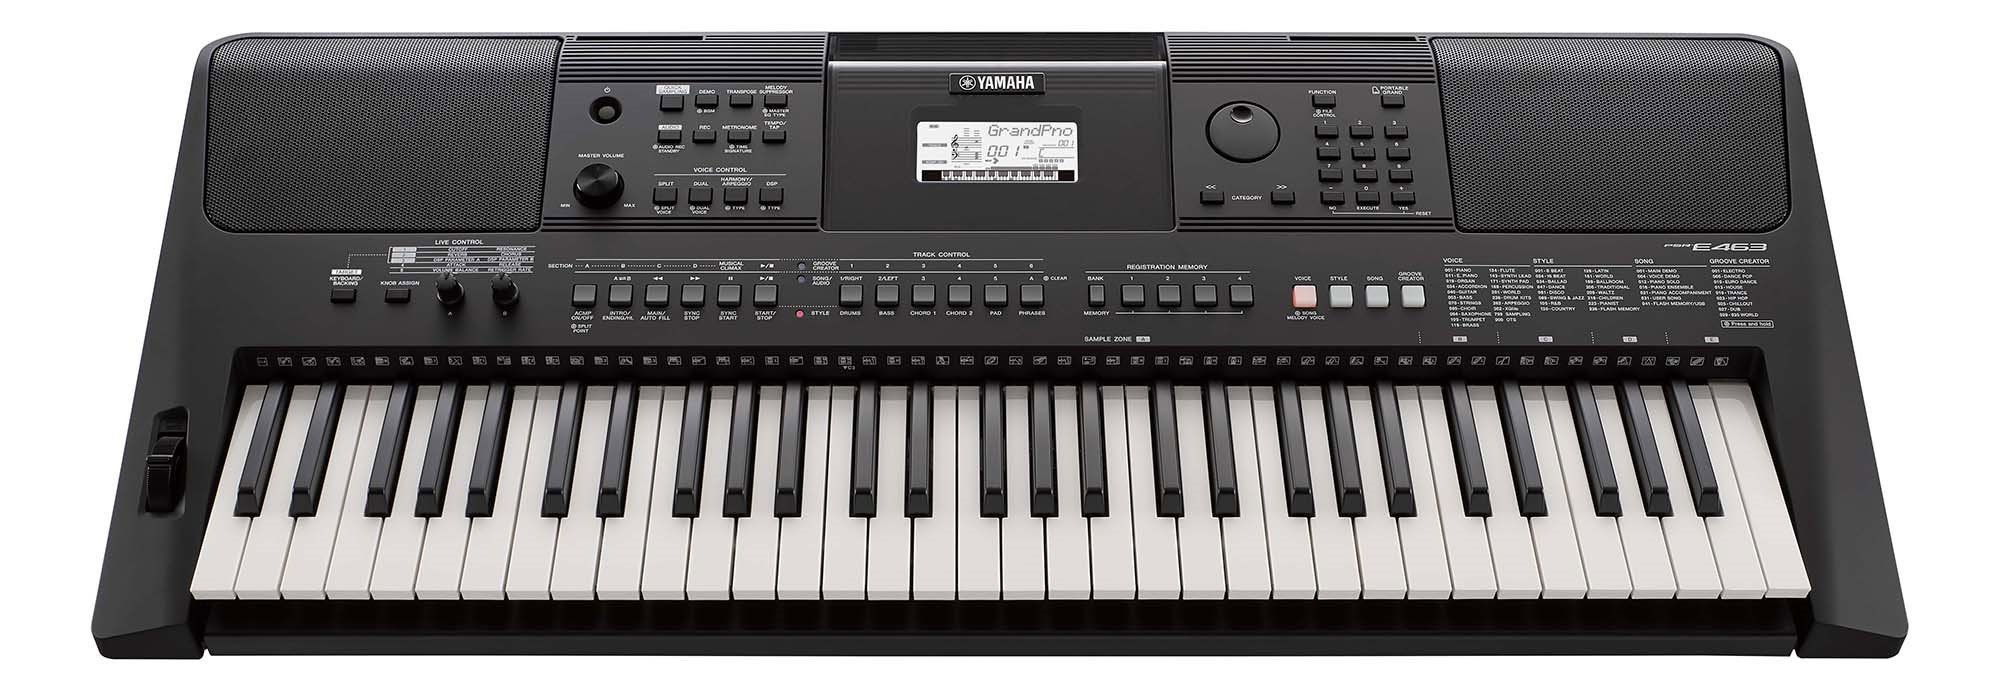 Yamaha PSRE463 61-key high-level portable keyboard